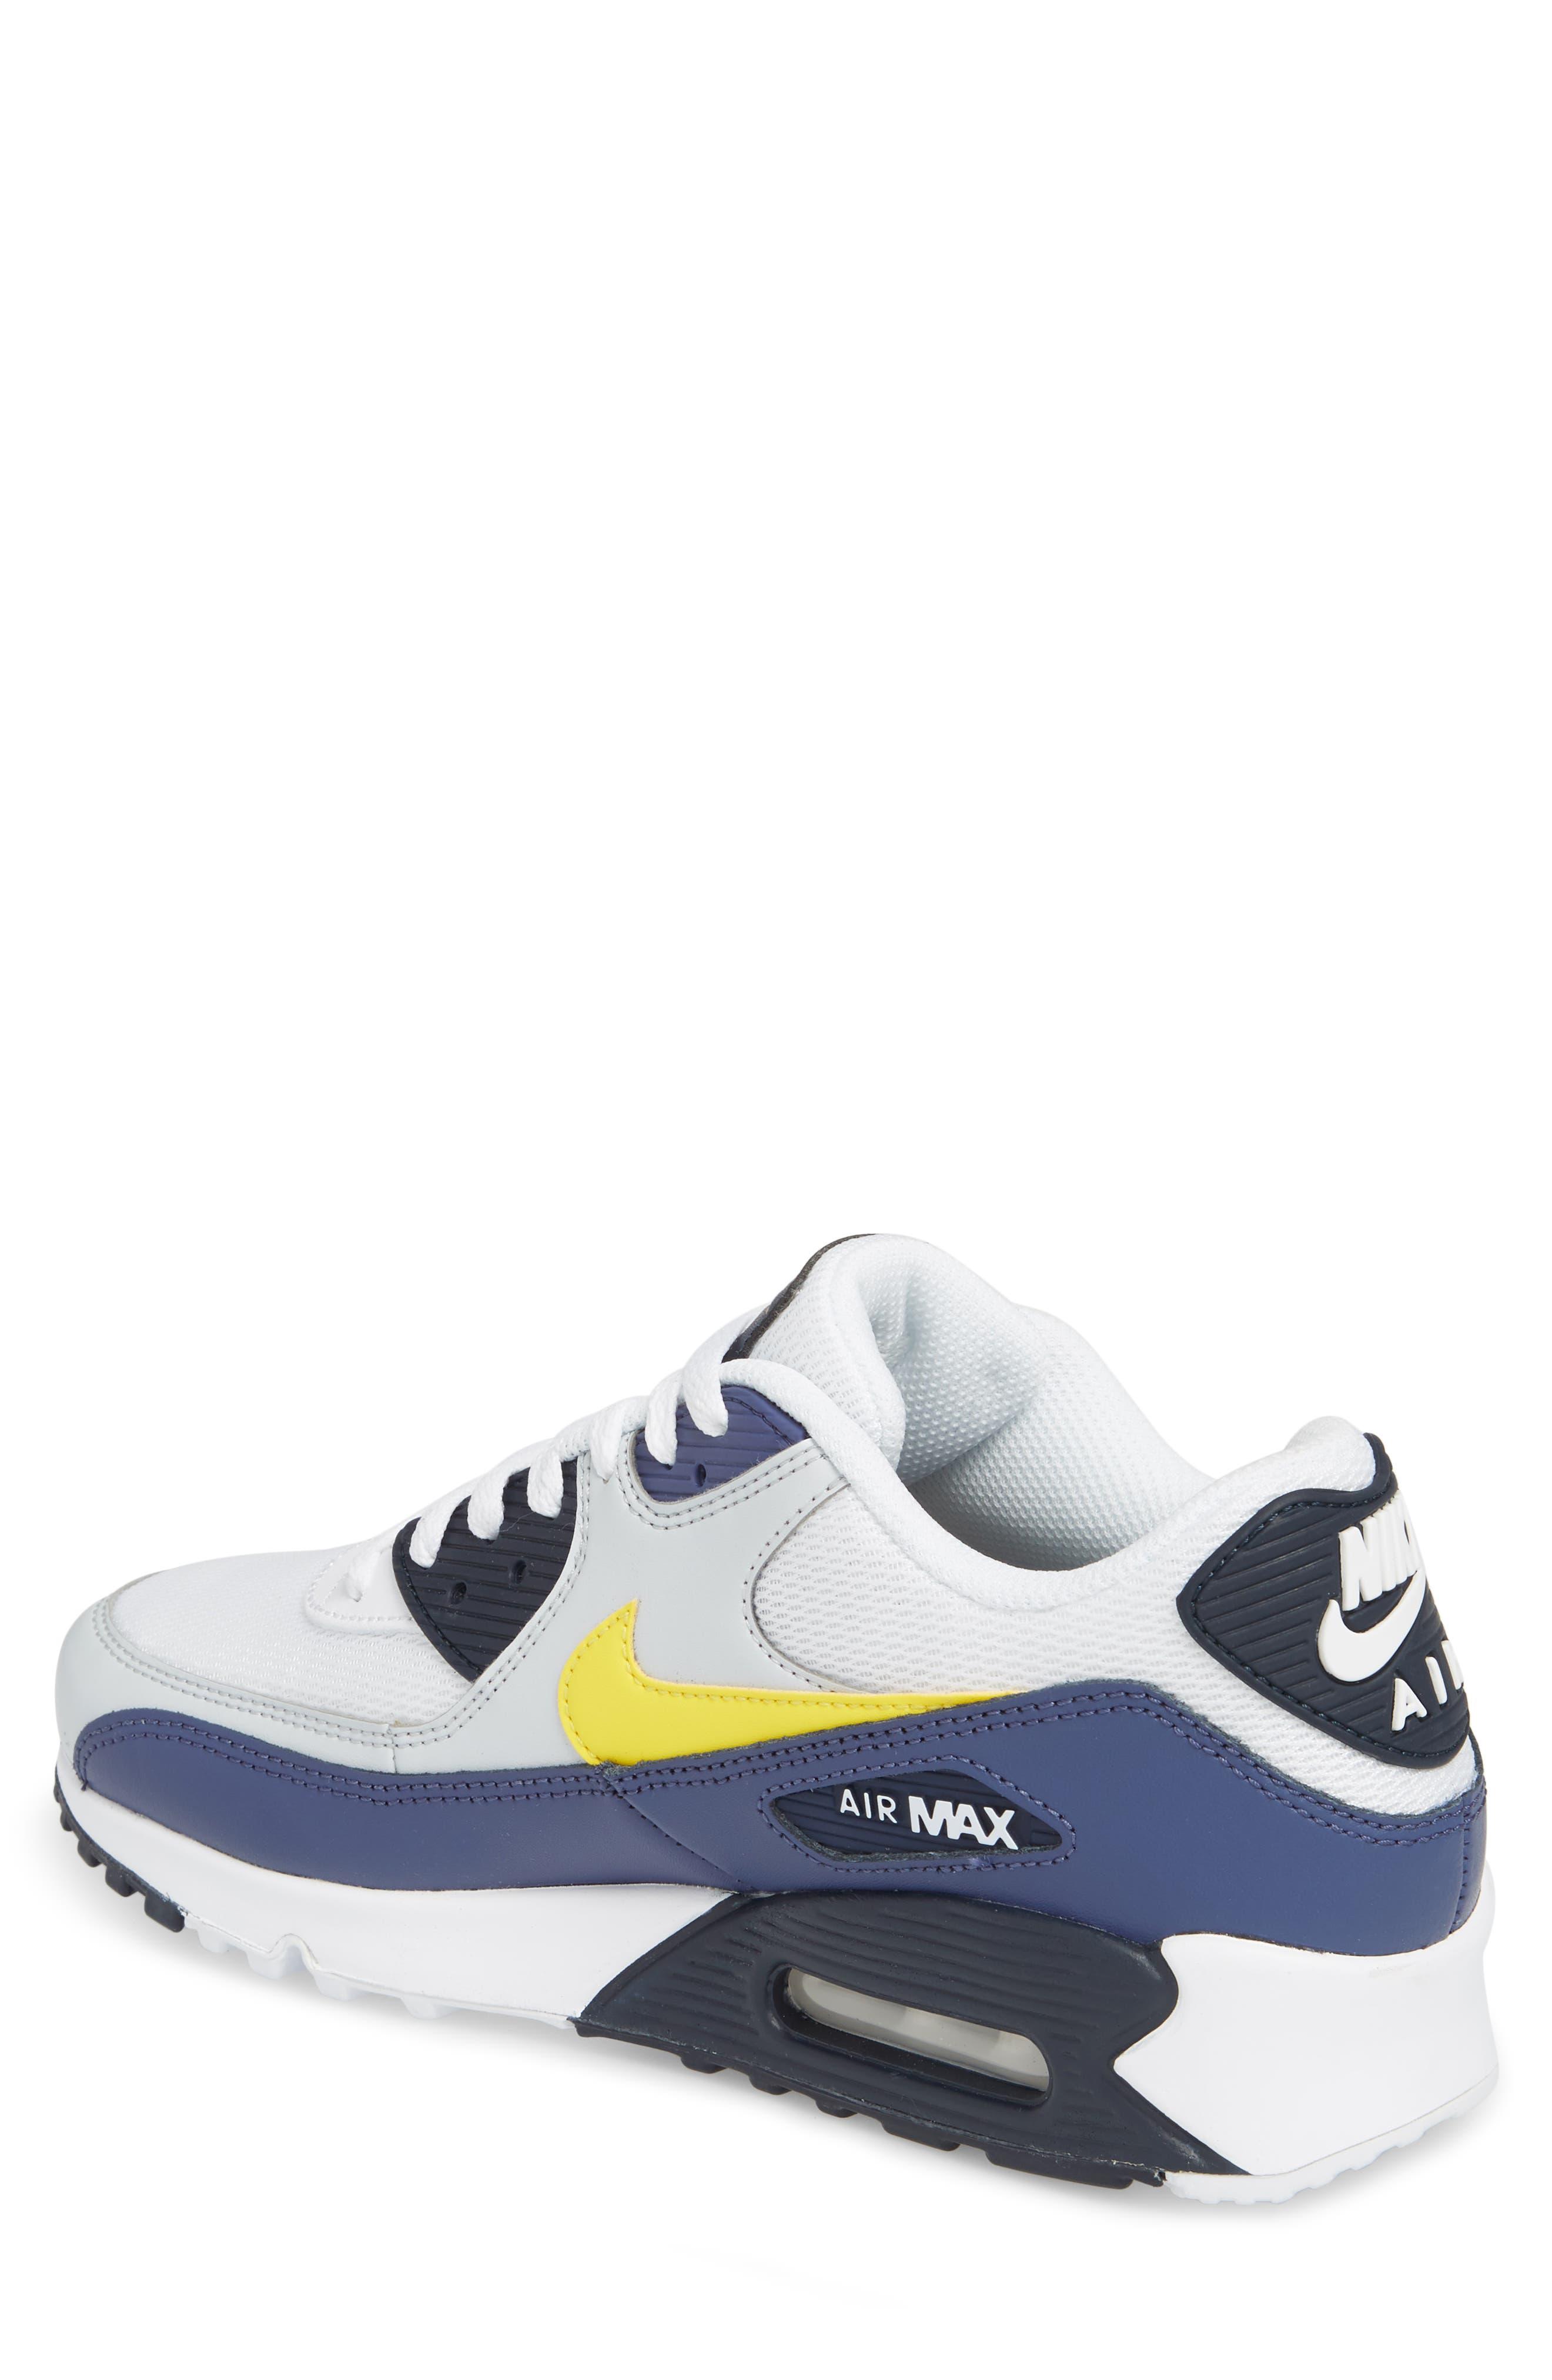 Air Max 90 Essential Sneaker,                             Alternate thumbnail 2, color,                             White/ Tour Yellow/ Blue